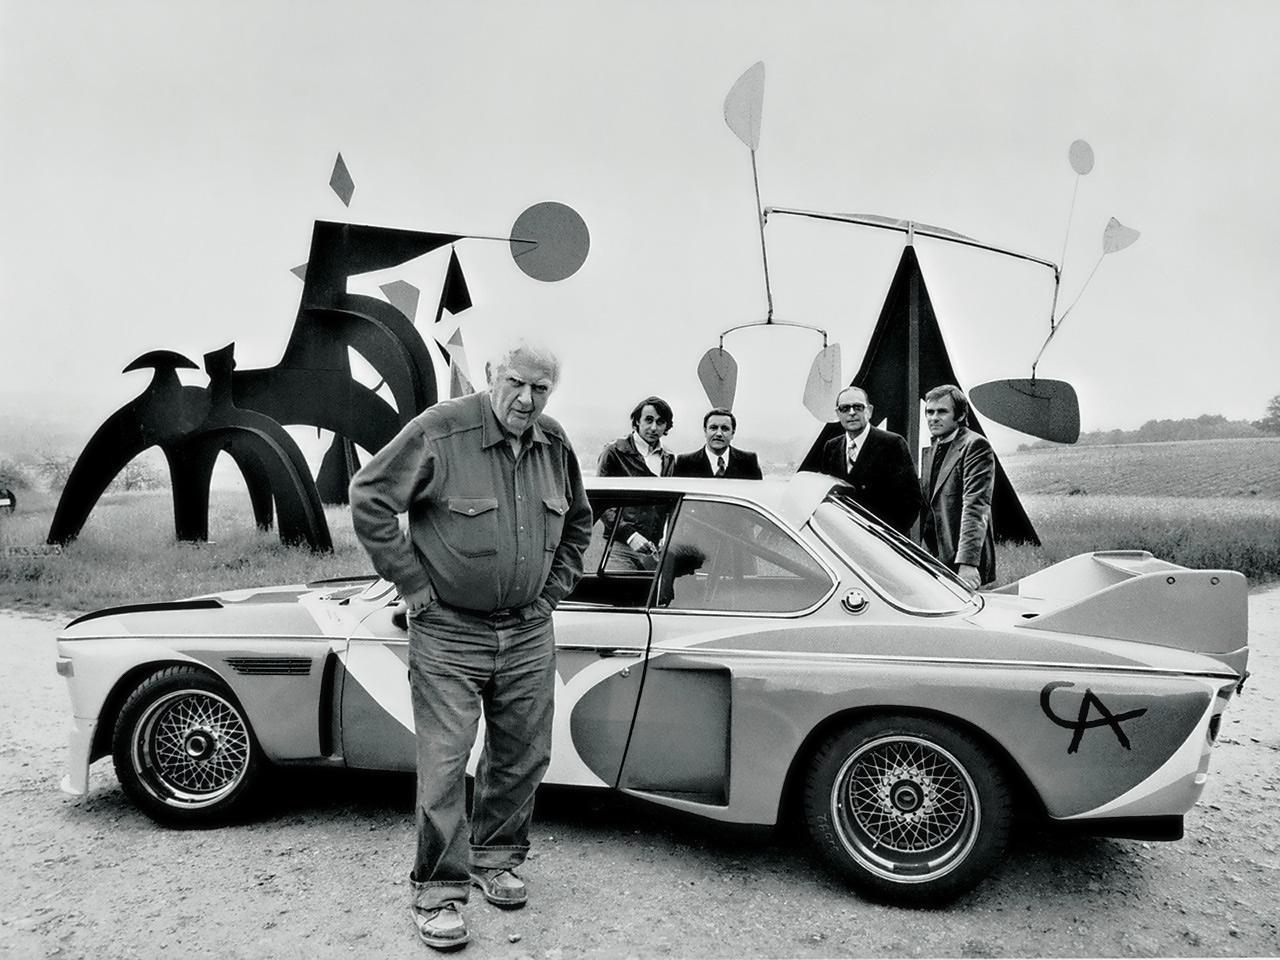 Alexander Calder in front of his BMW Art Car